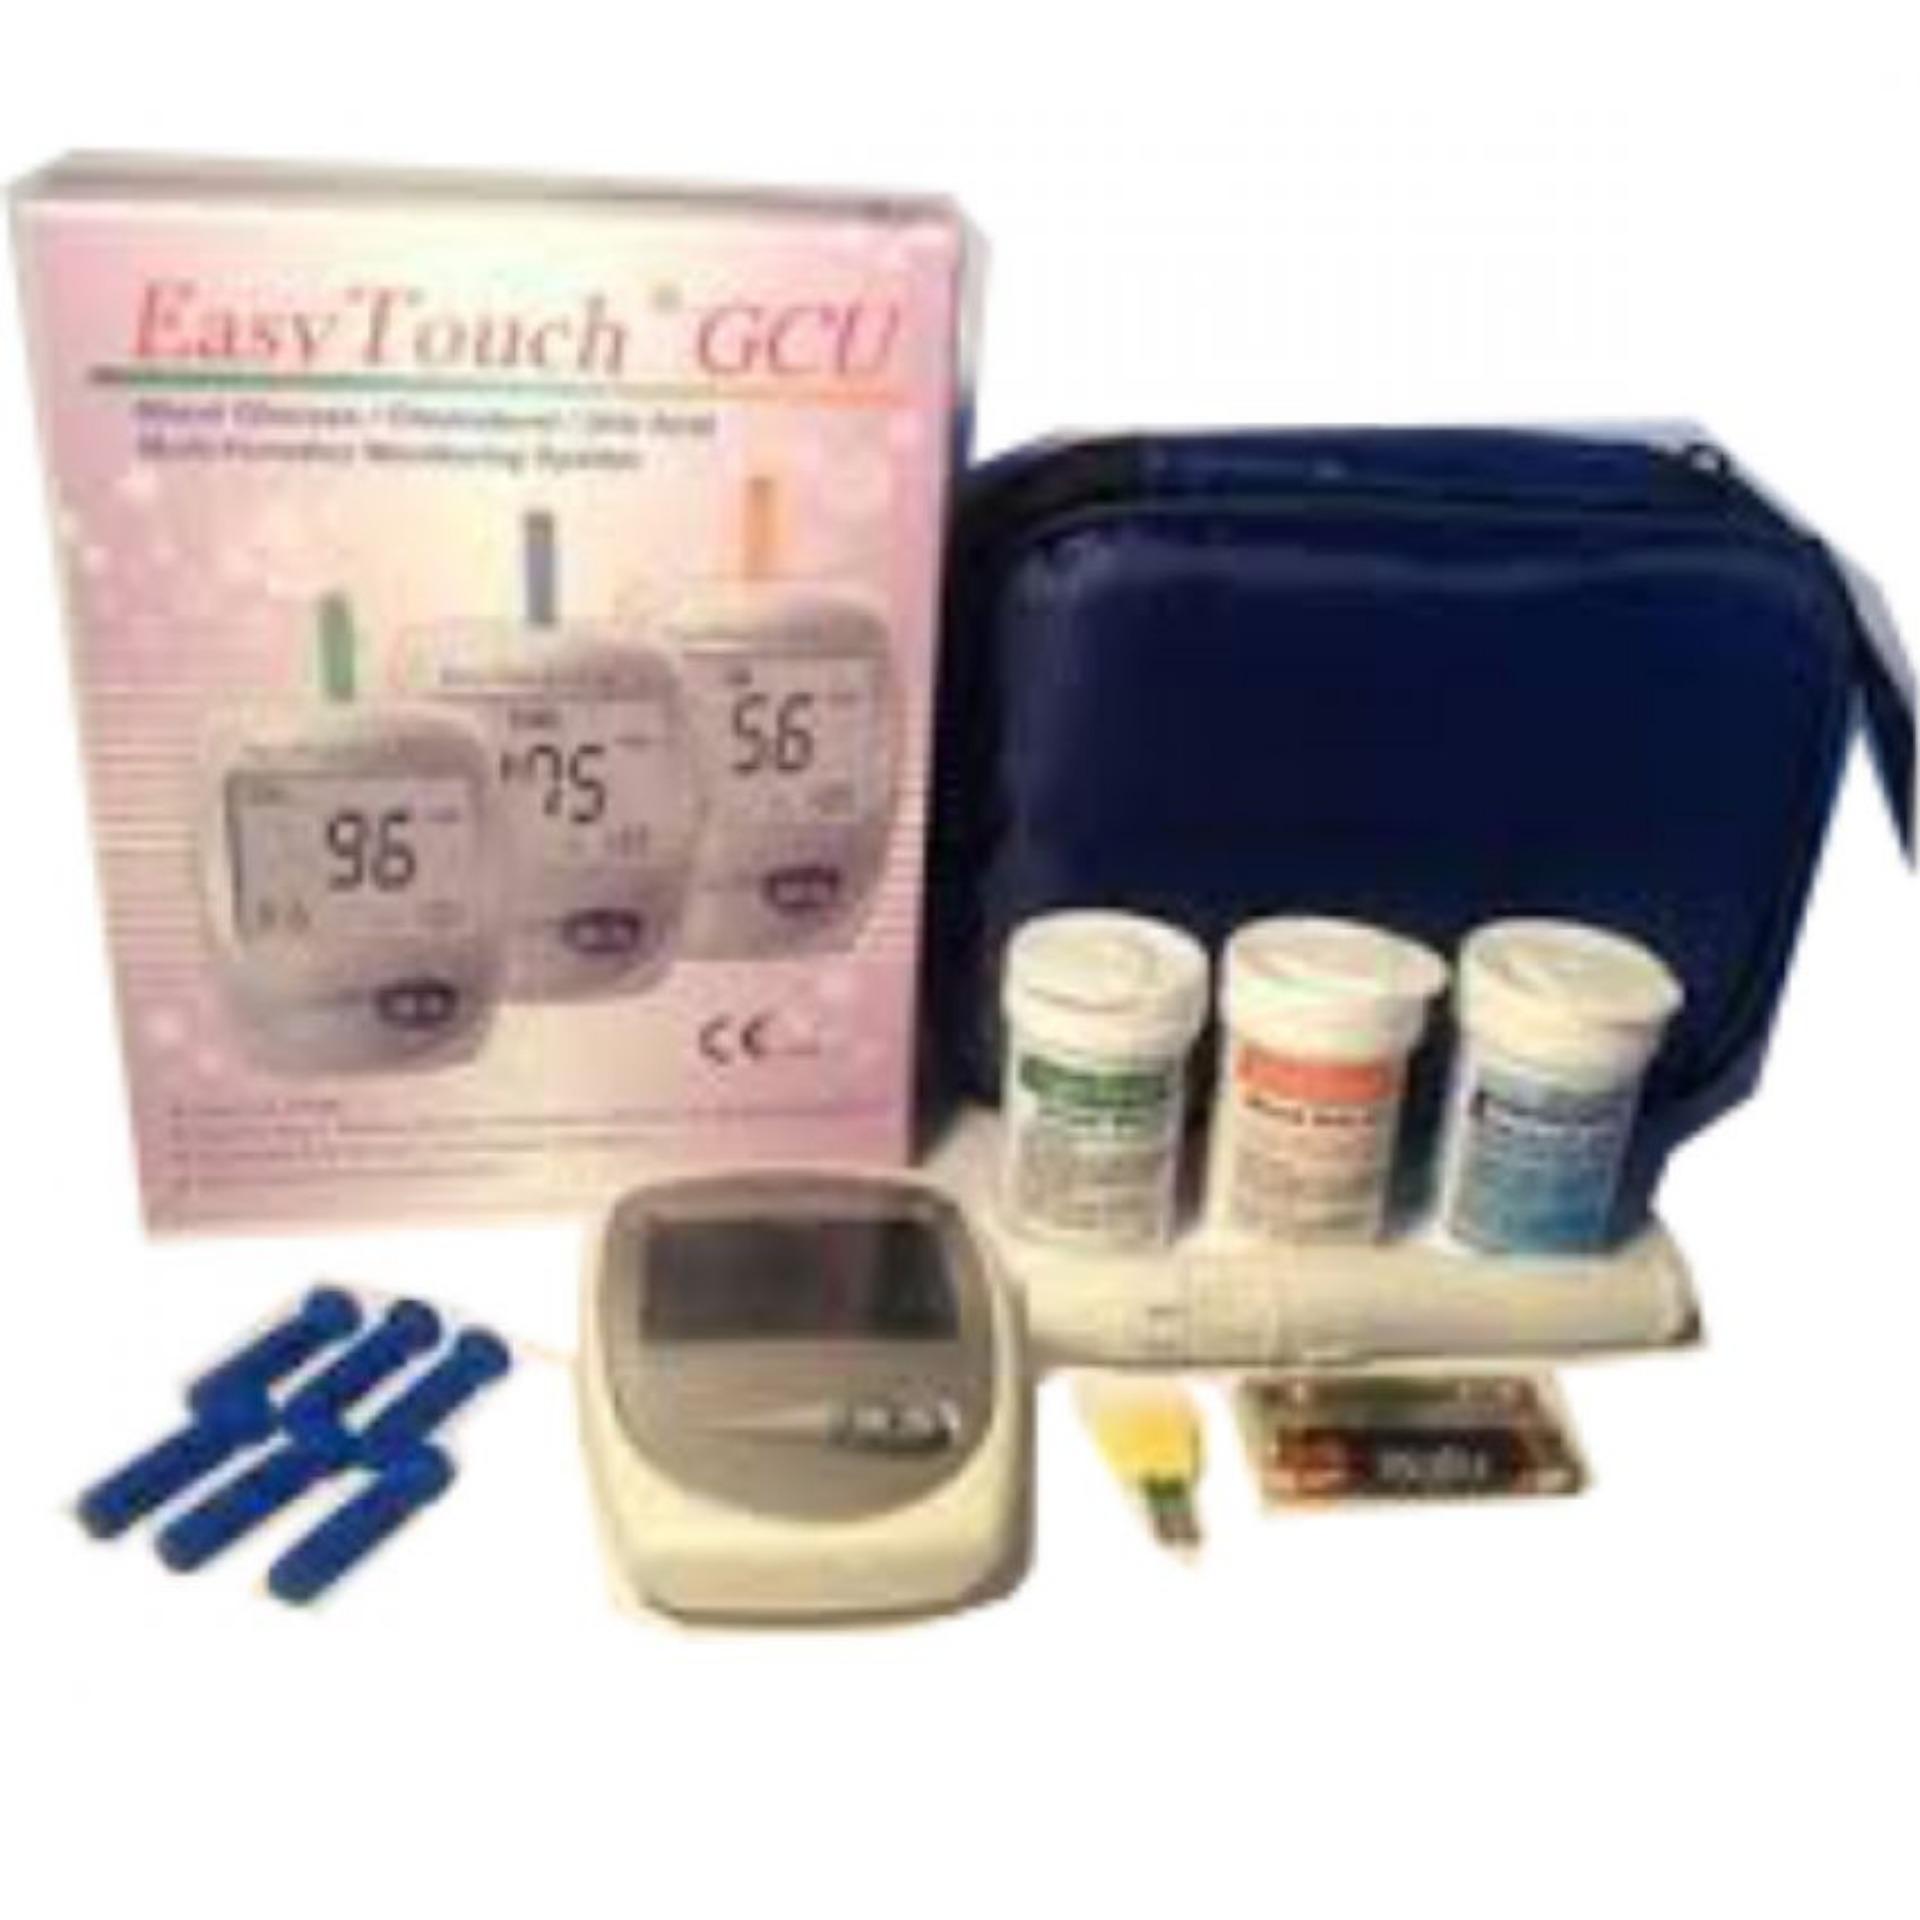 Eshop Checker Easy Touch Gcu Alat Cek Darah 3 In 1 Kolesterol Test Gula Asam Urat Cholesterol 3in1 Dangula